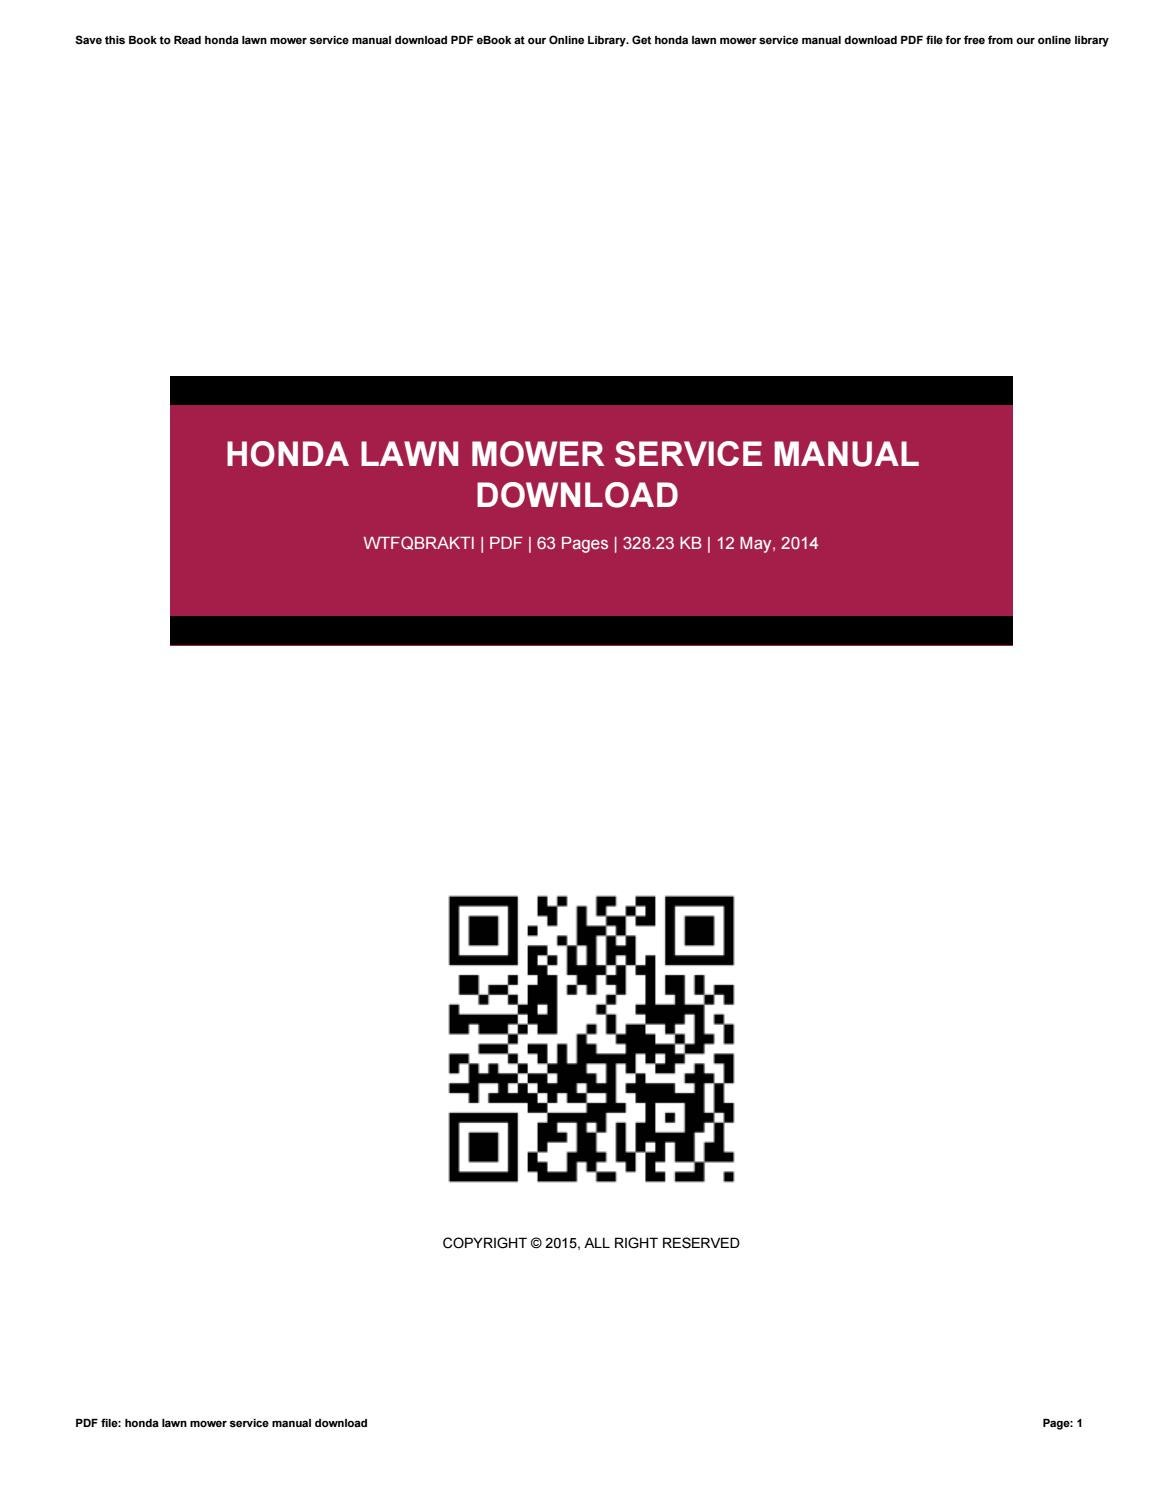 ... Array - honda mower engines manuals ebook rh honda mower engines manuals  ebook angelayu us